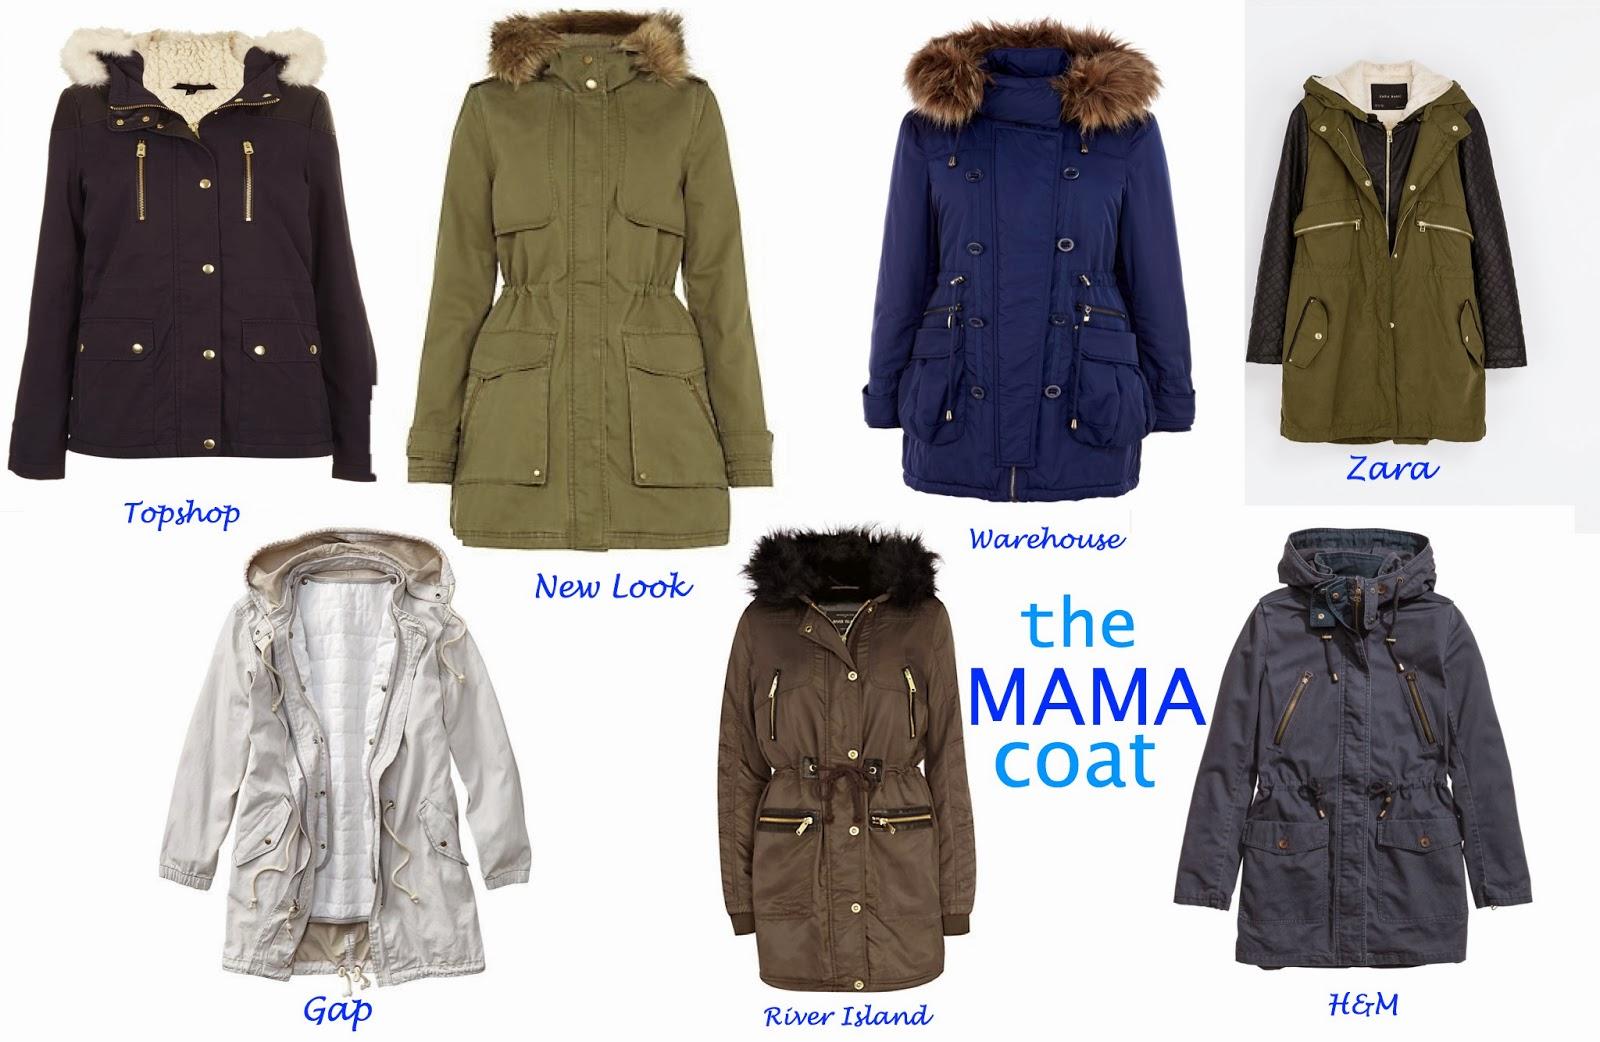 V. I. BUYS | The coat that all stylish mamas are wearing | Parka coats | the mama uniform | practical coats for new mums | style | fashion for mums | coats | mamasVIB